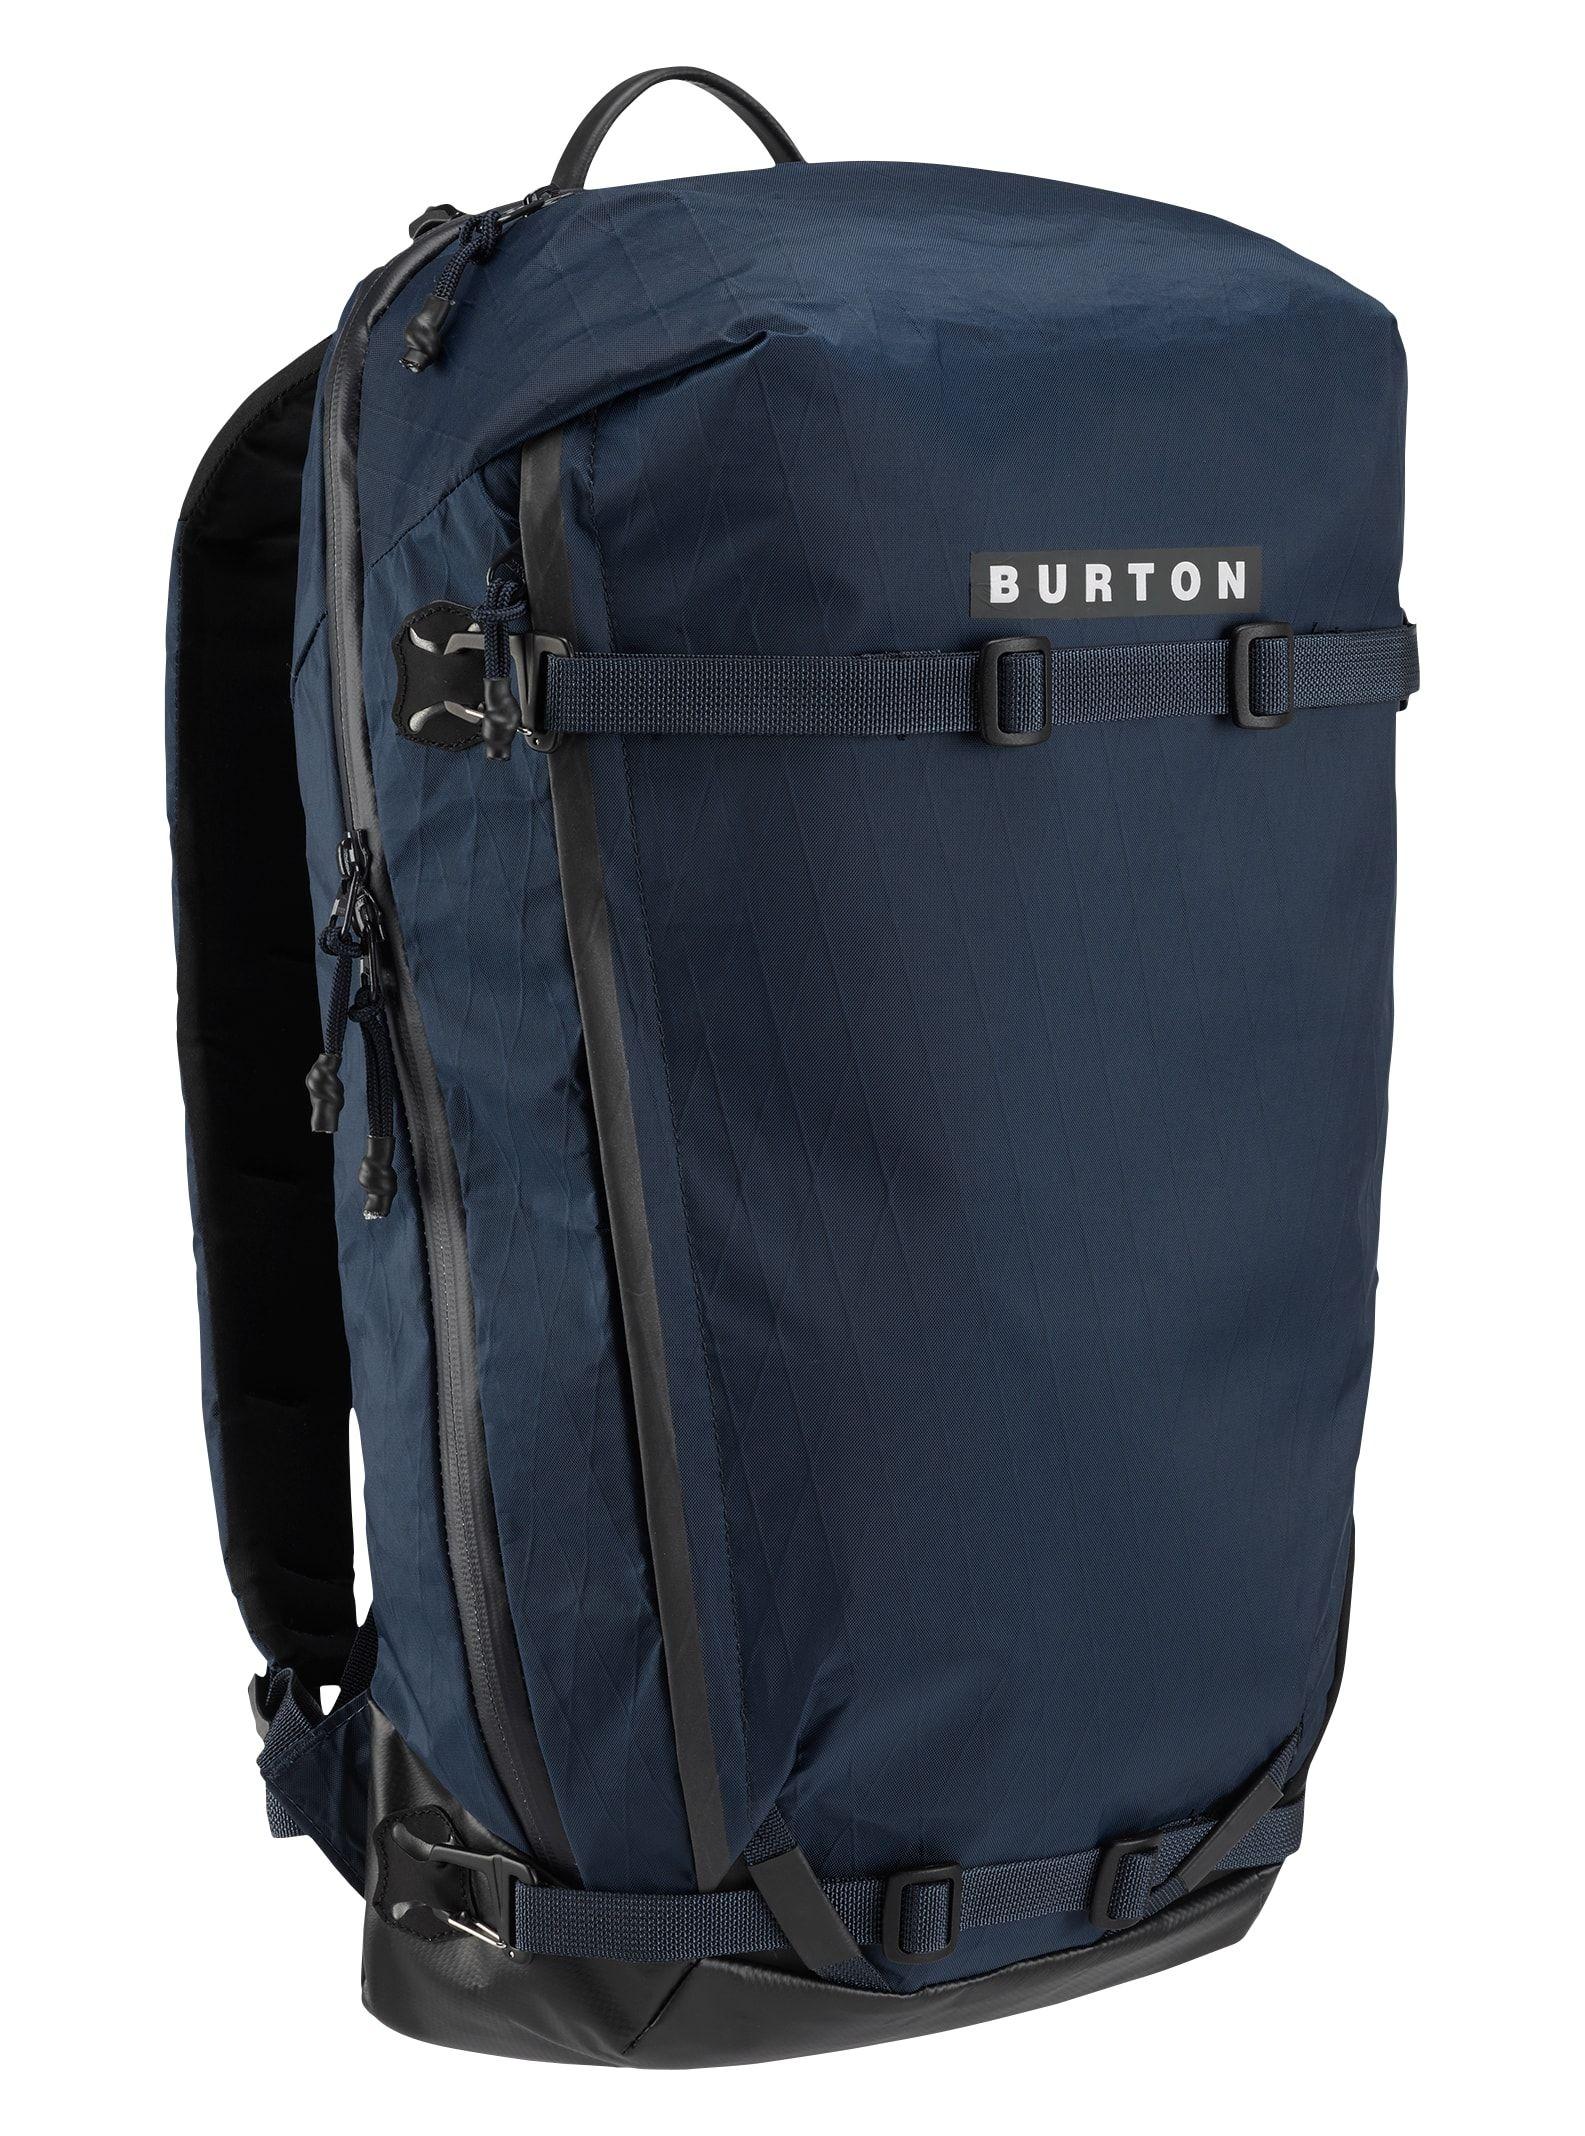 e8d7594cf4b Burton Gorge Backpack   背包   Burton backpack, Backpacks, Burton bags